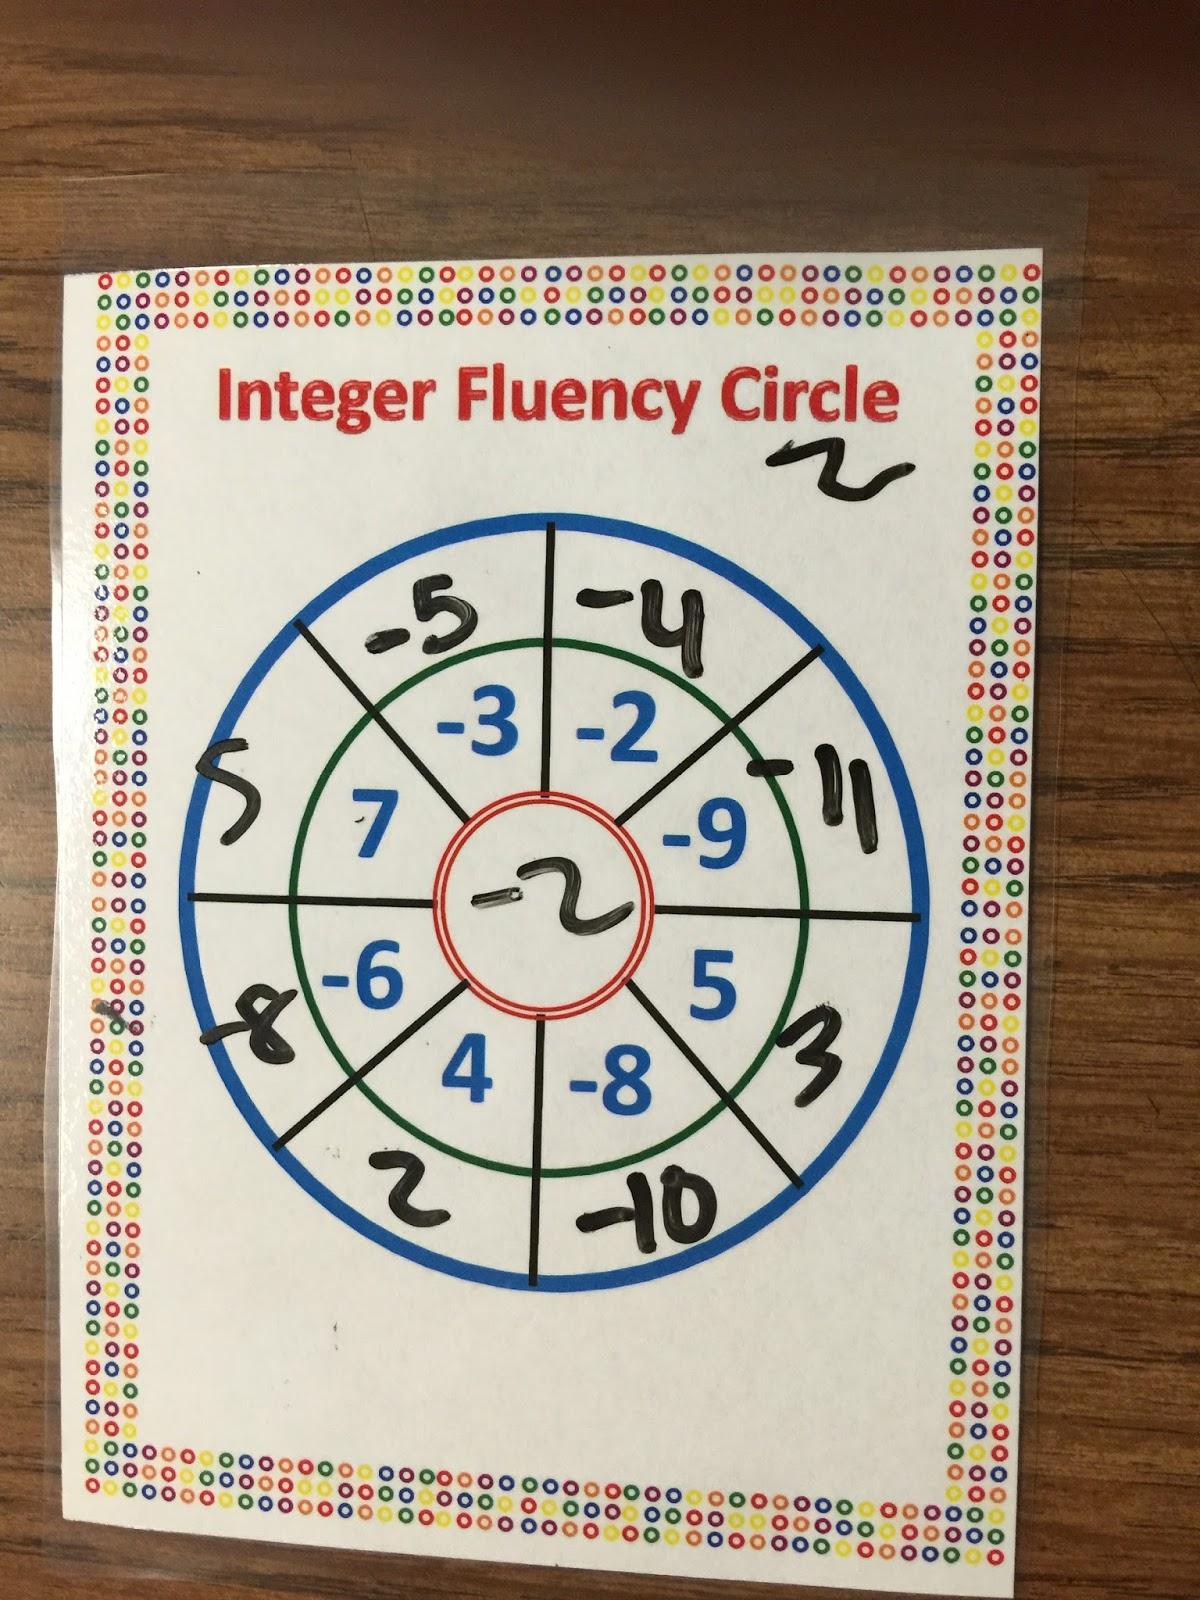 My Math Imagination Integer Fluency